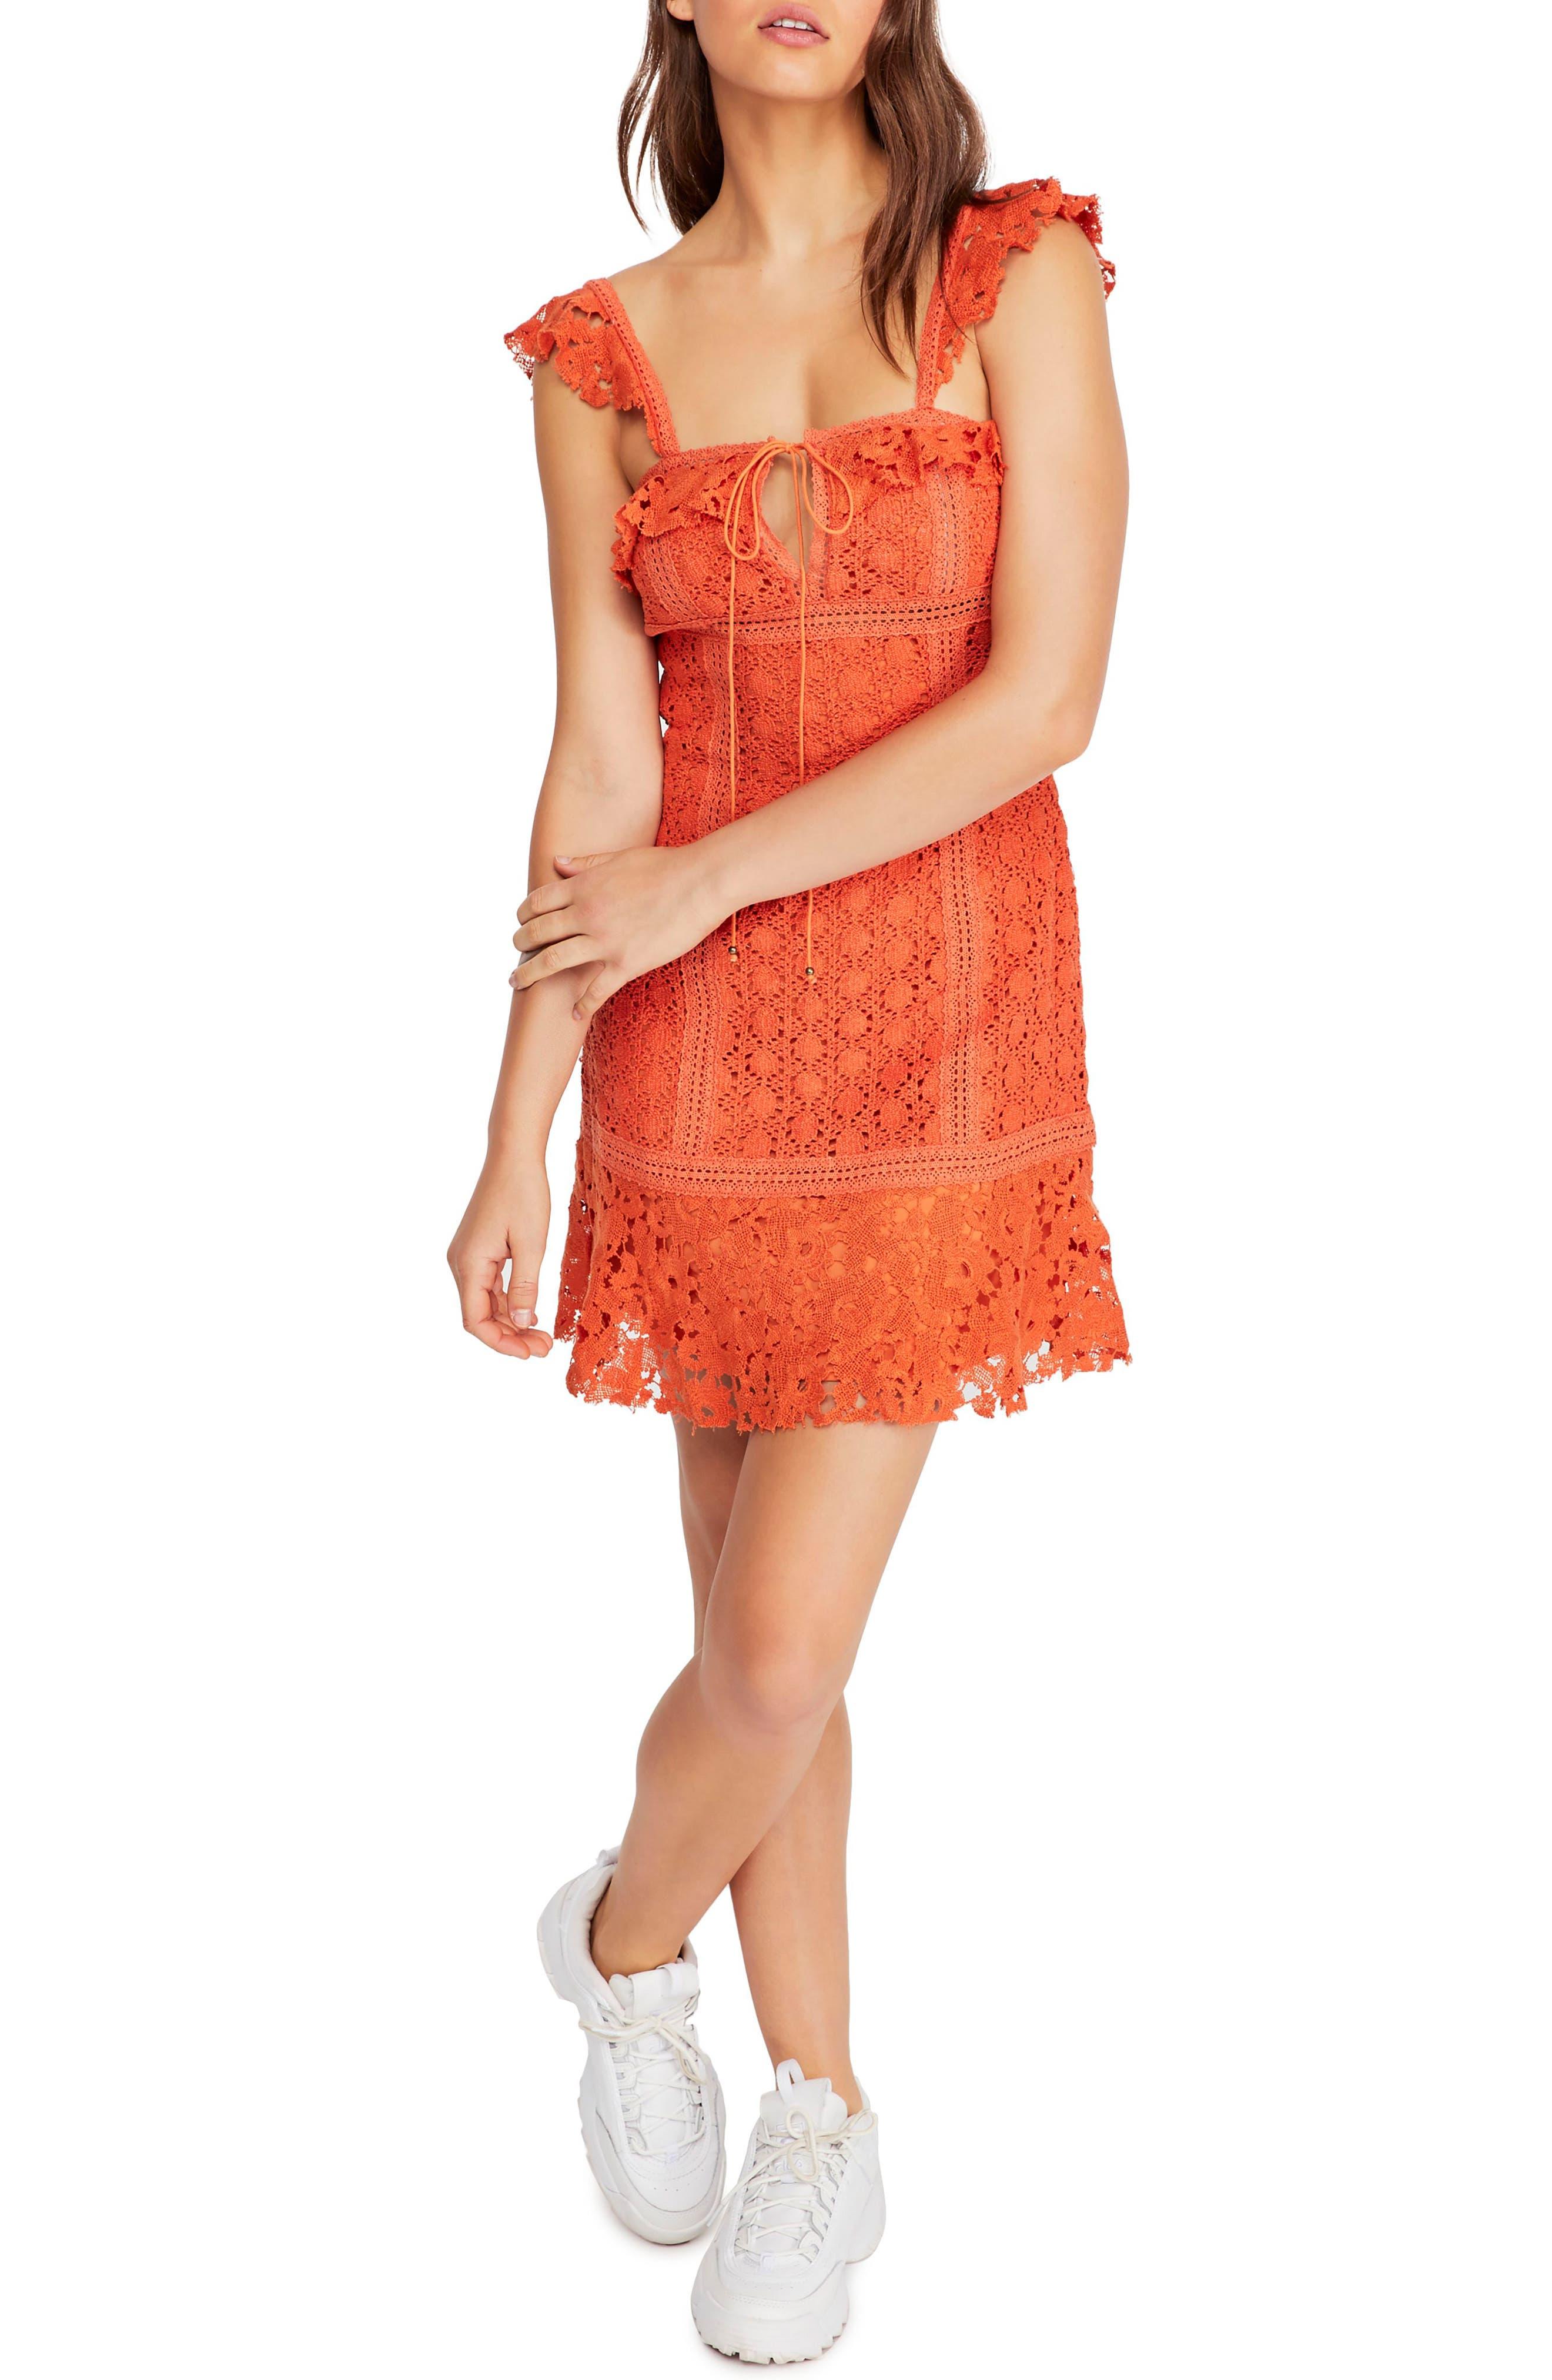 Free People Cross My Heart Minidress, Orange